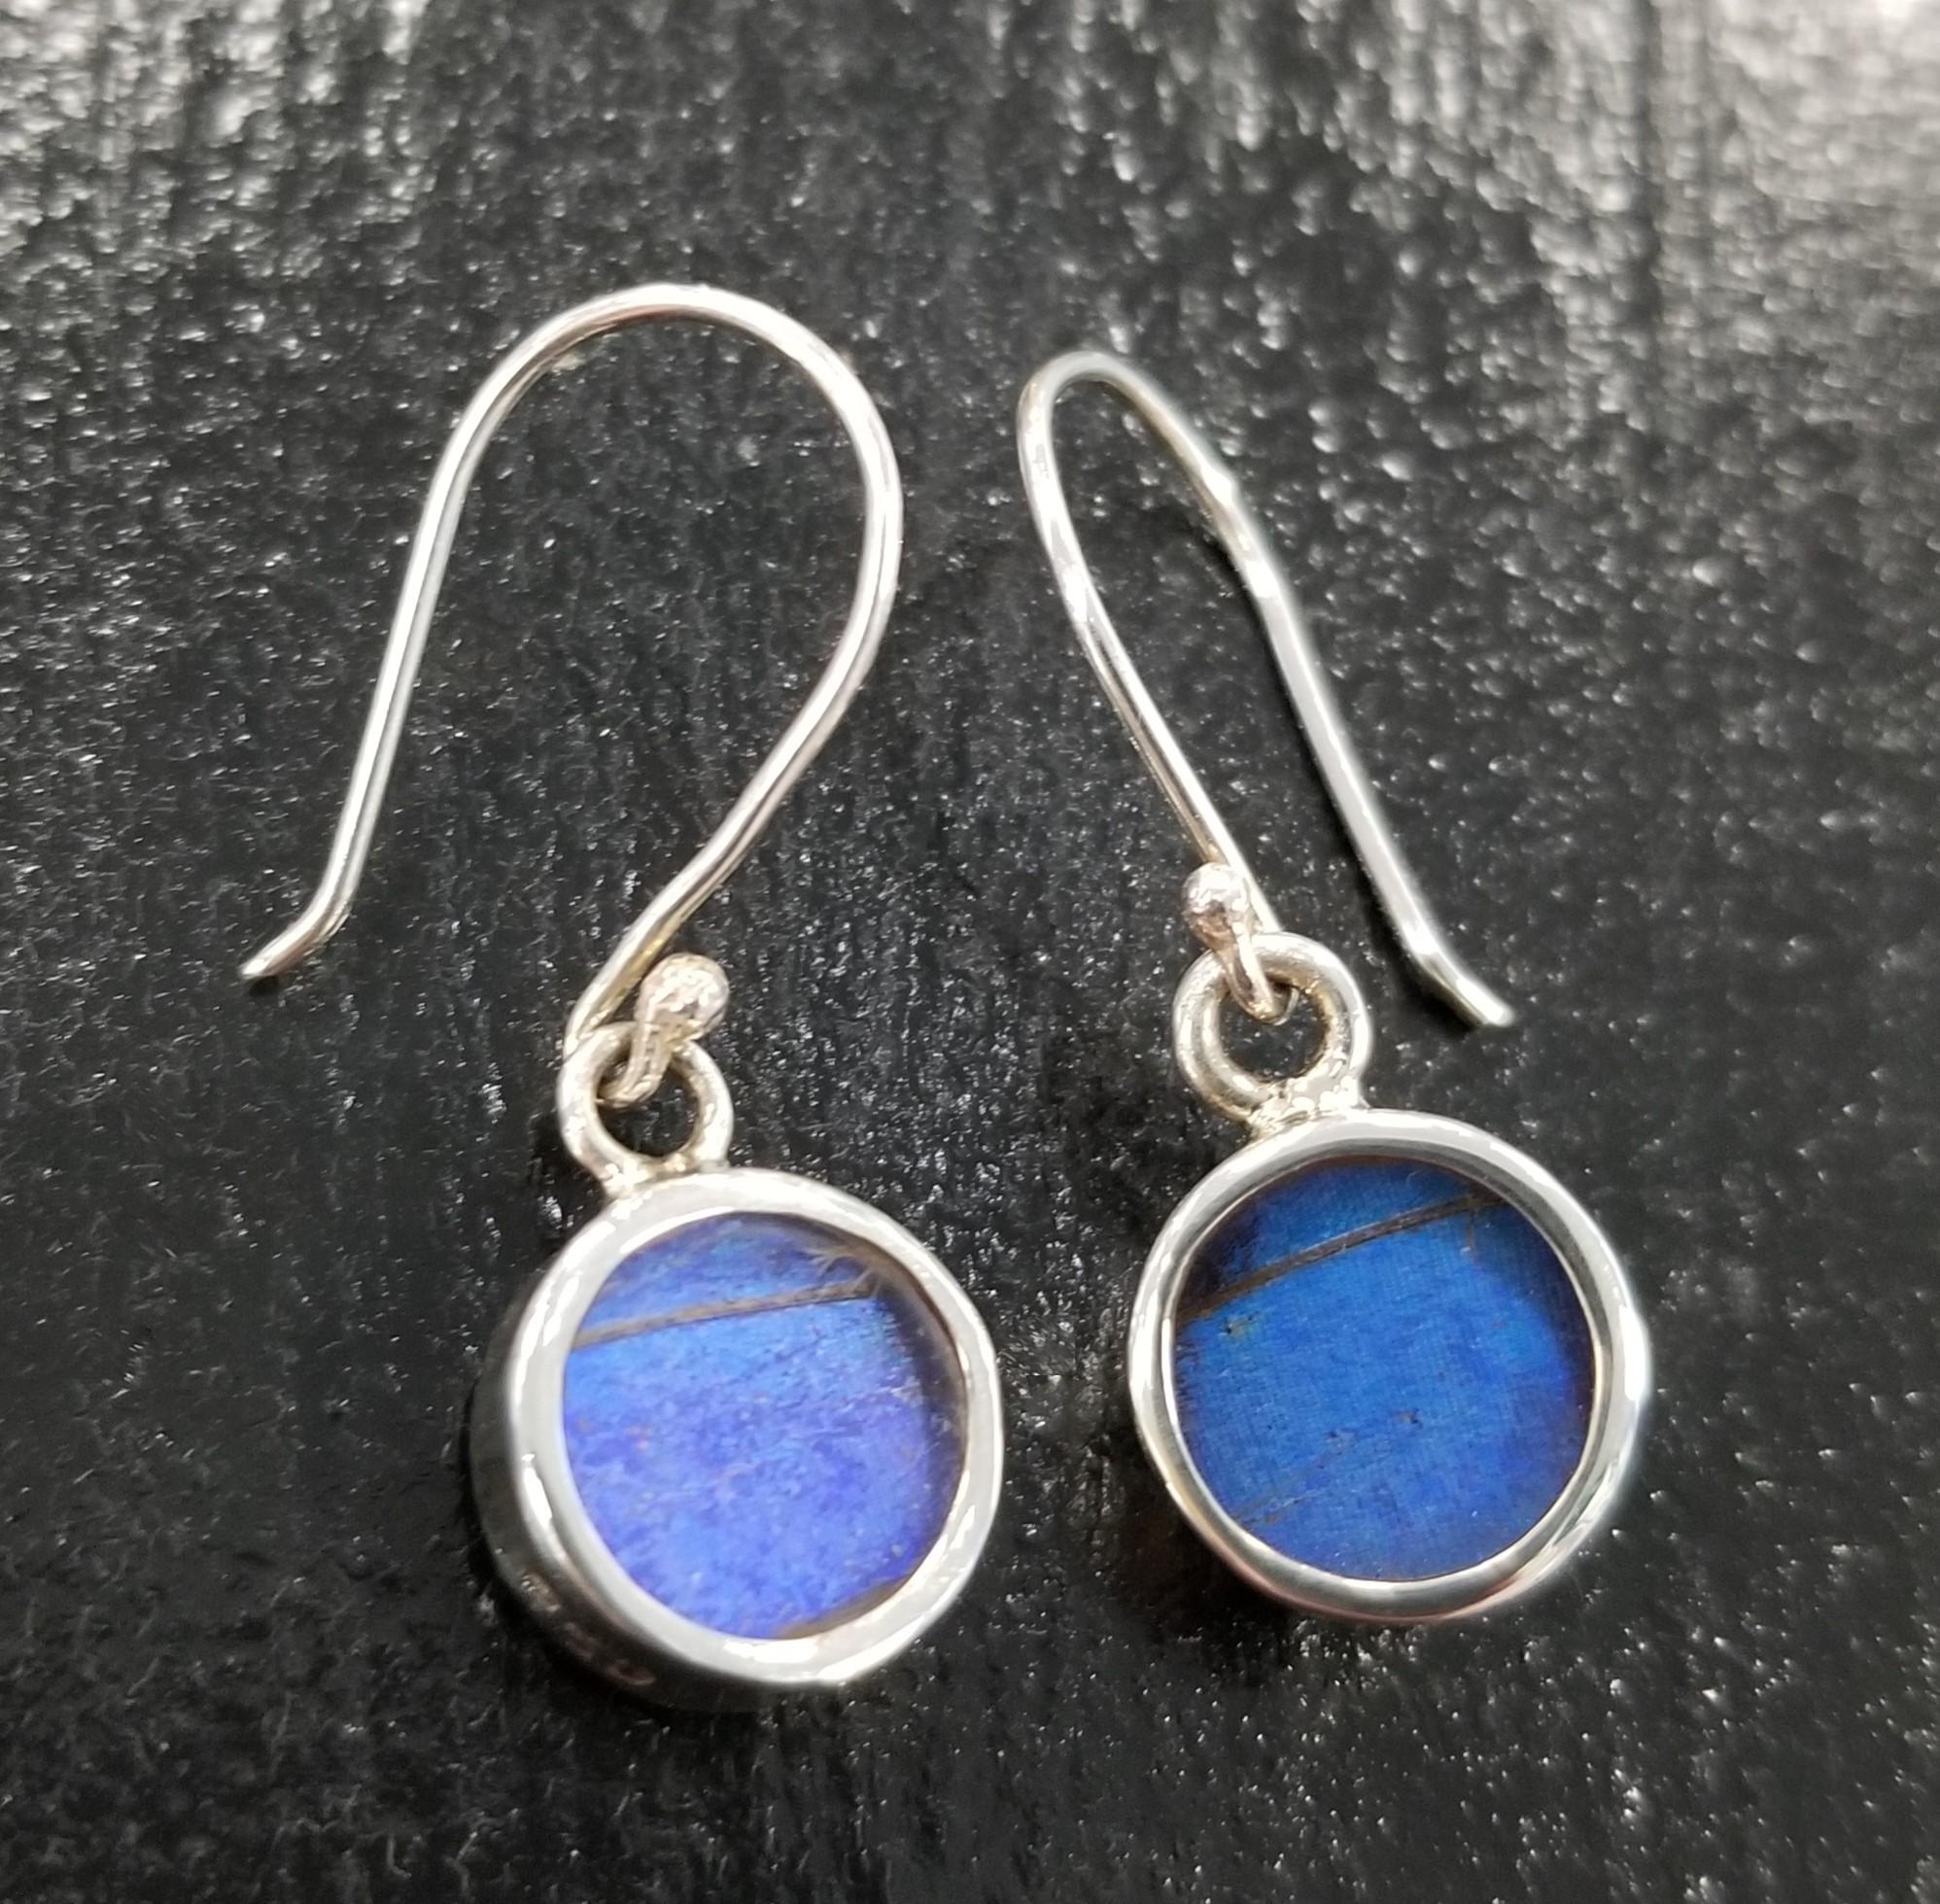 Real blue morpho petite sterling silver earrings